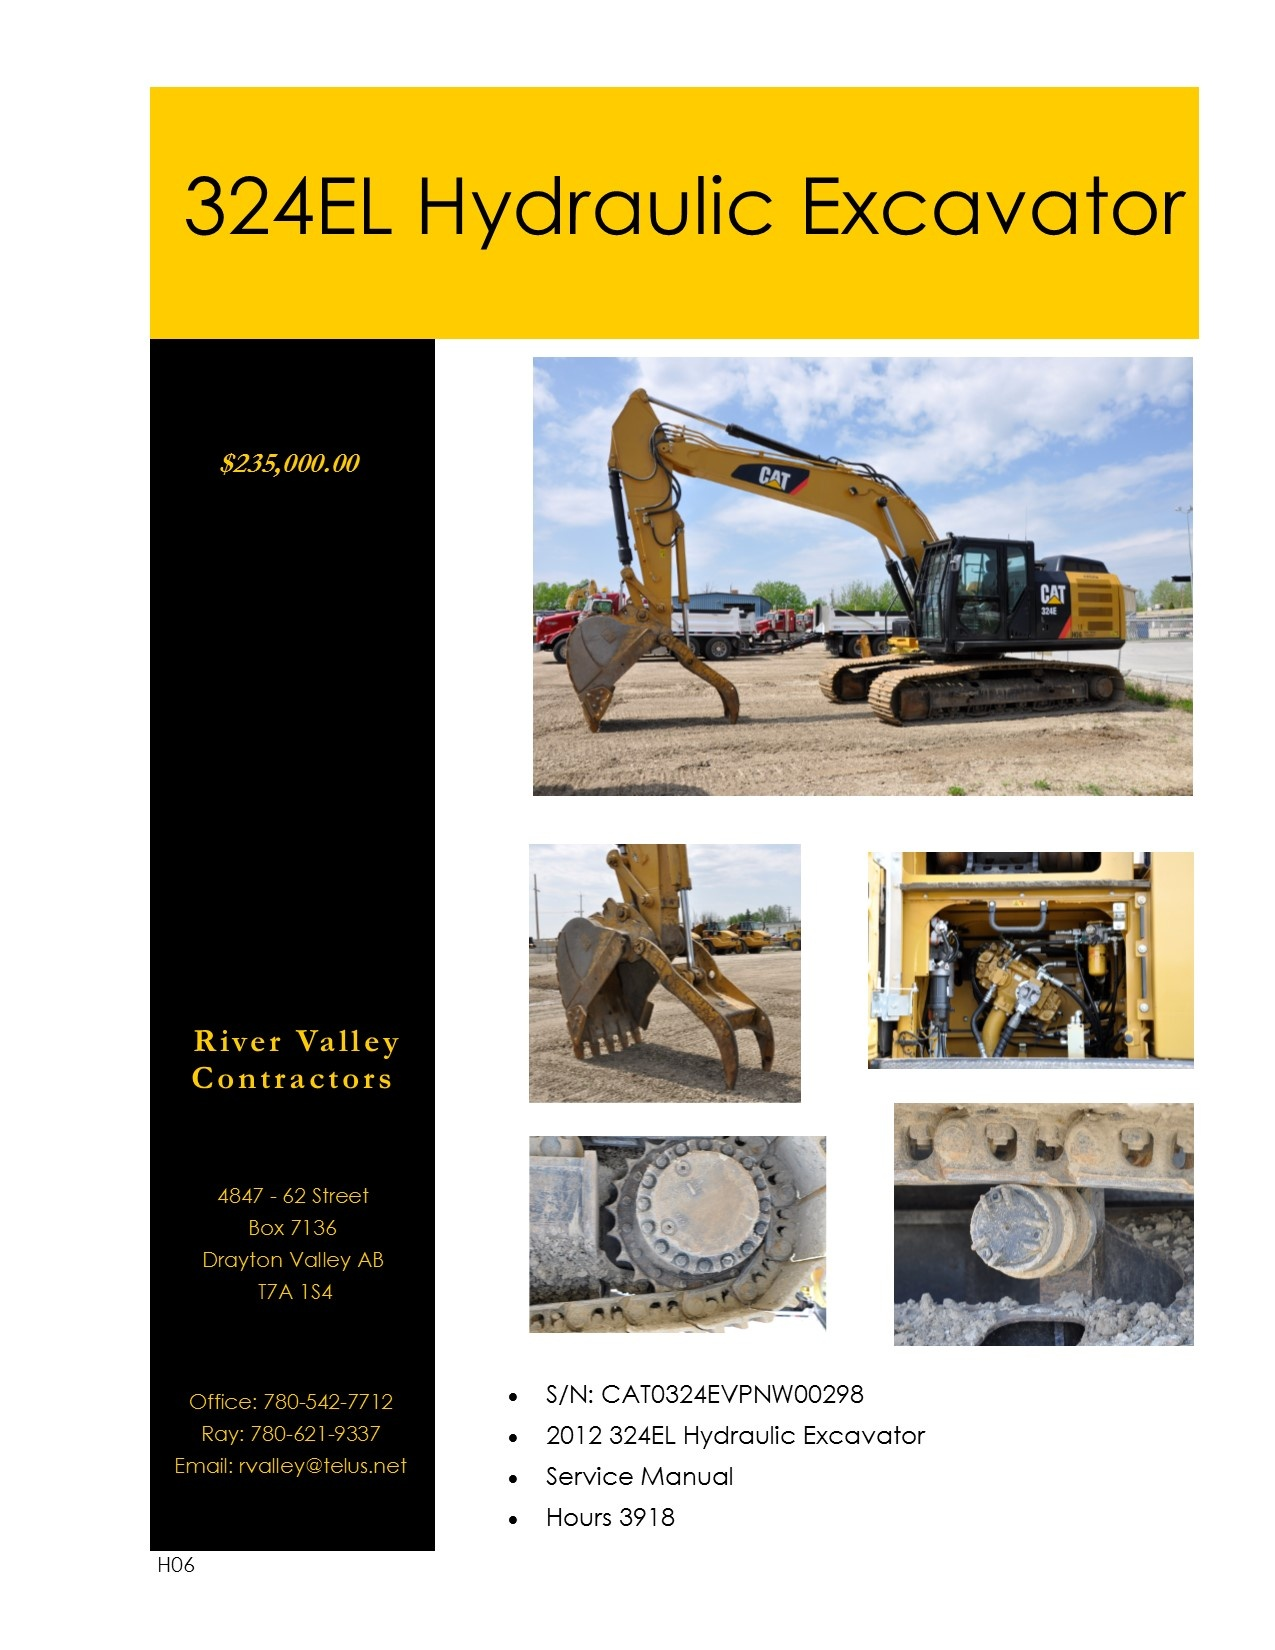 https://0901.nccdn.net/4_2/000/000/038/2d3/H06-324EL-Excavator-1275x1650.jpg